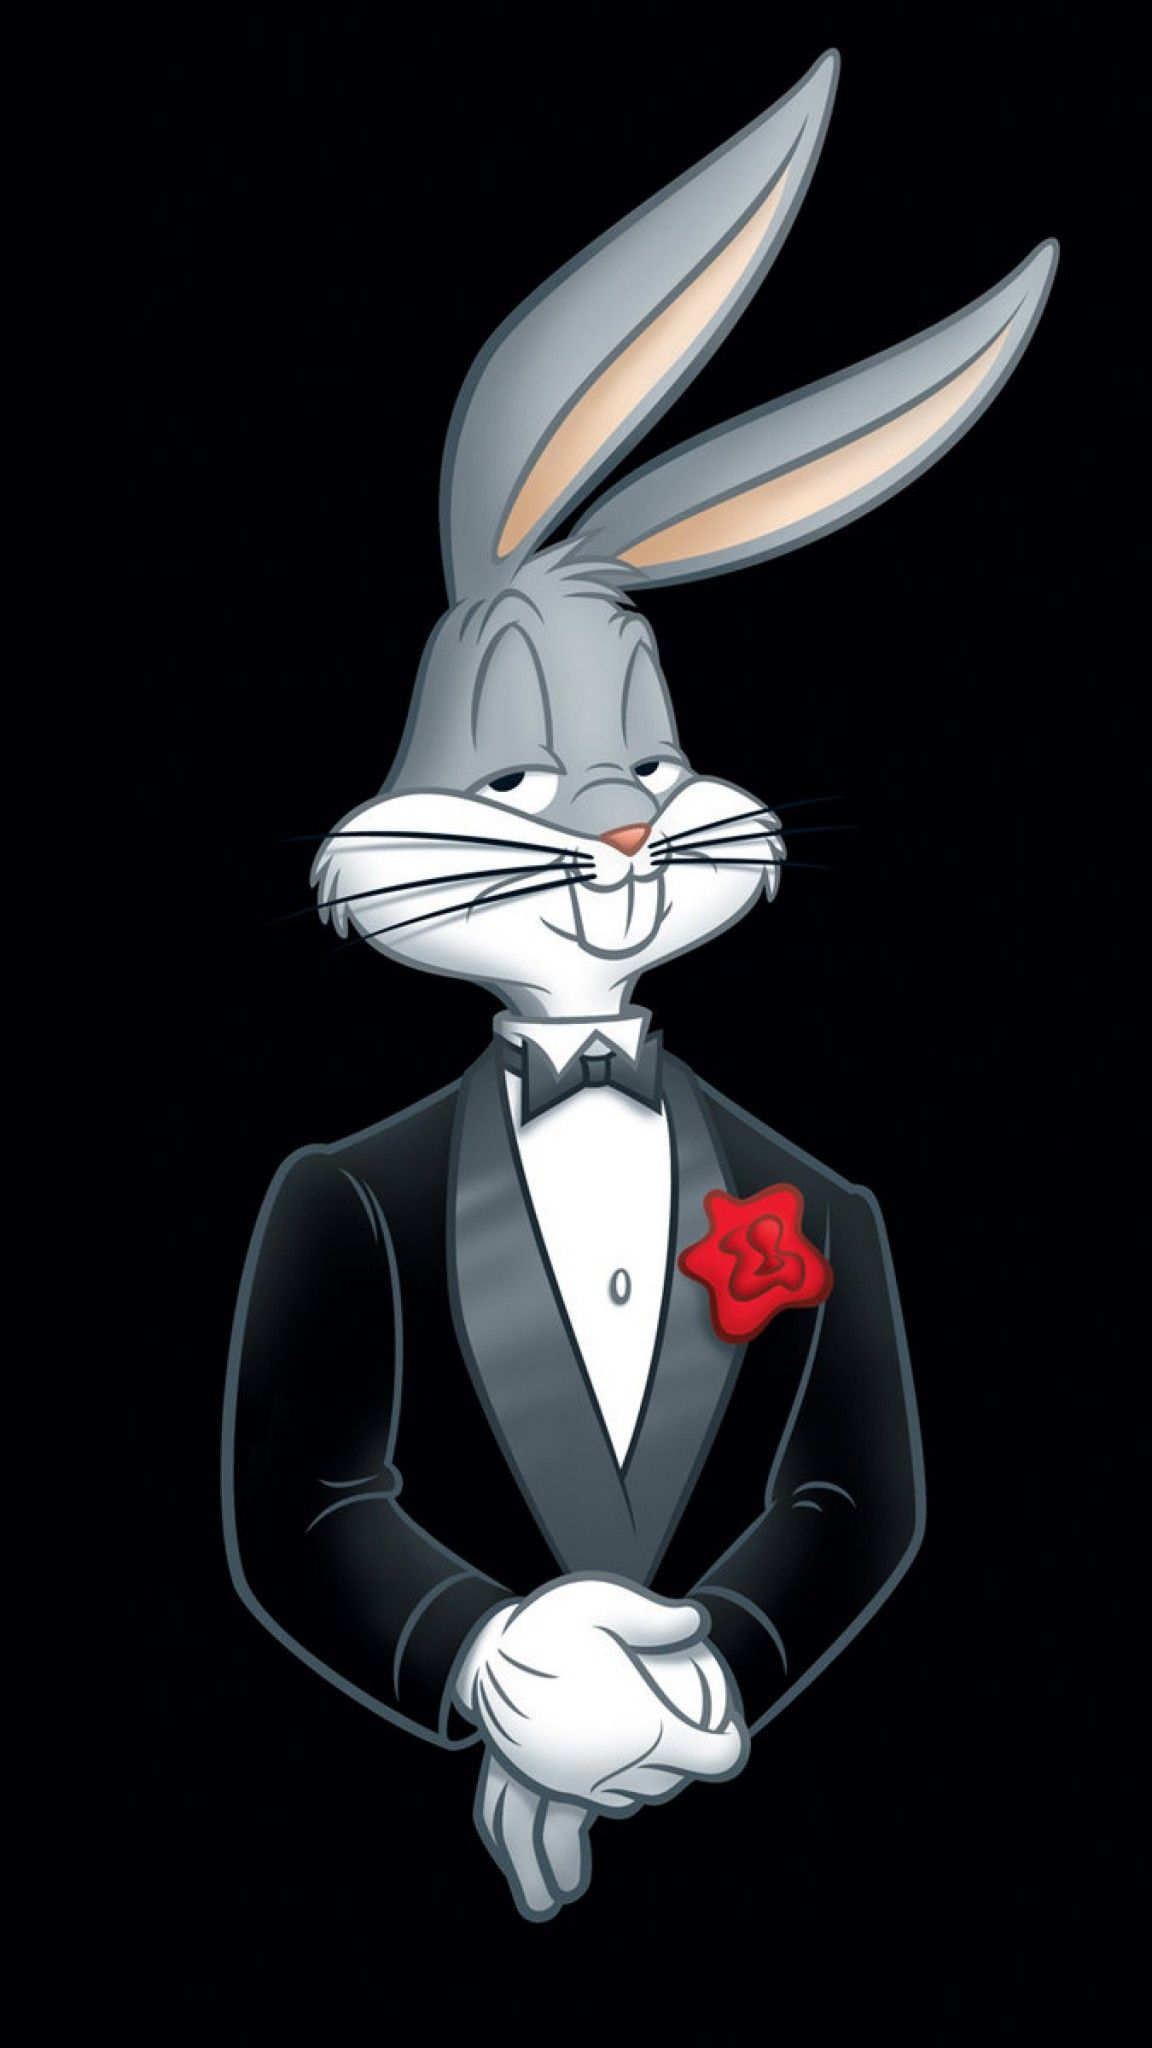 looney tunes, bugs bunny, rabbit, tuxedo, flower 4k, sony xperia z5